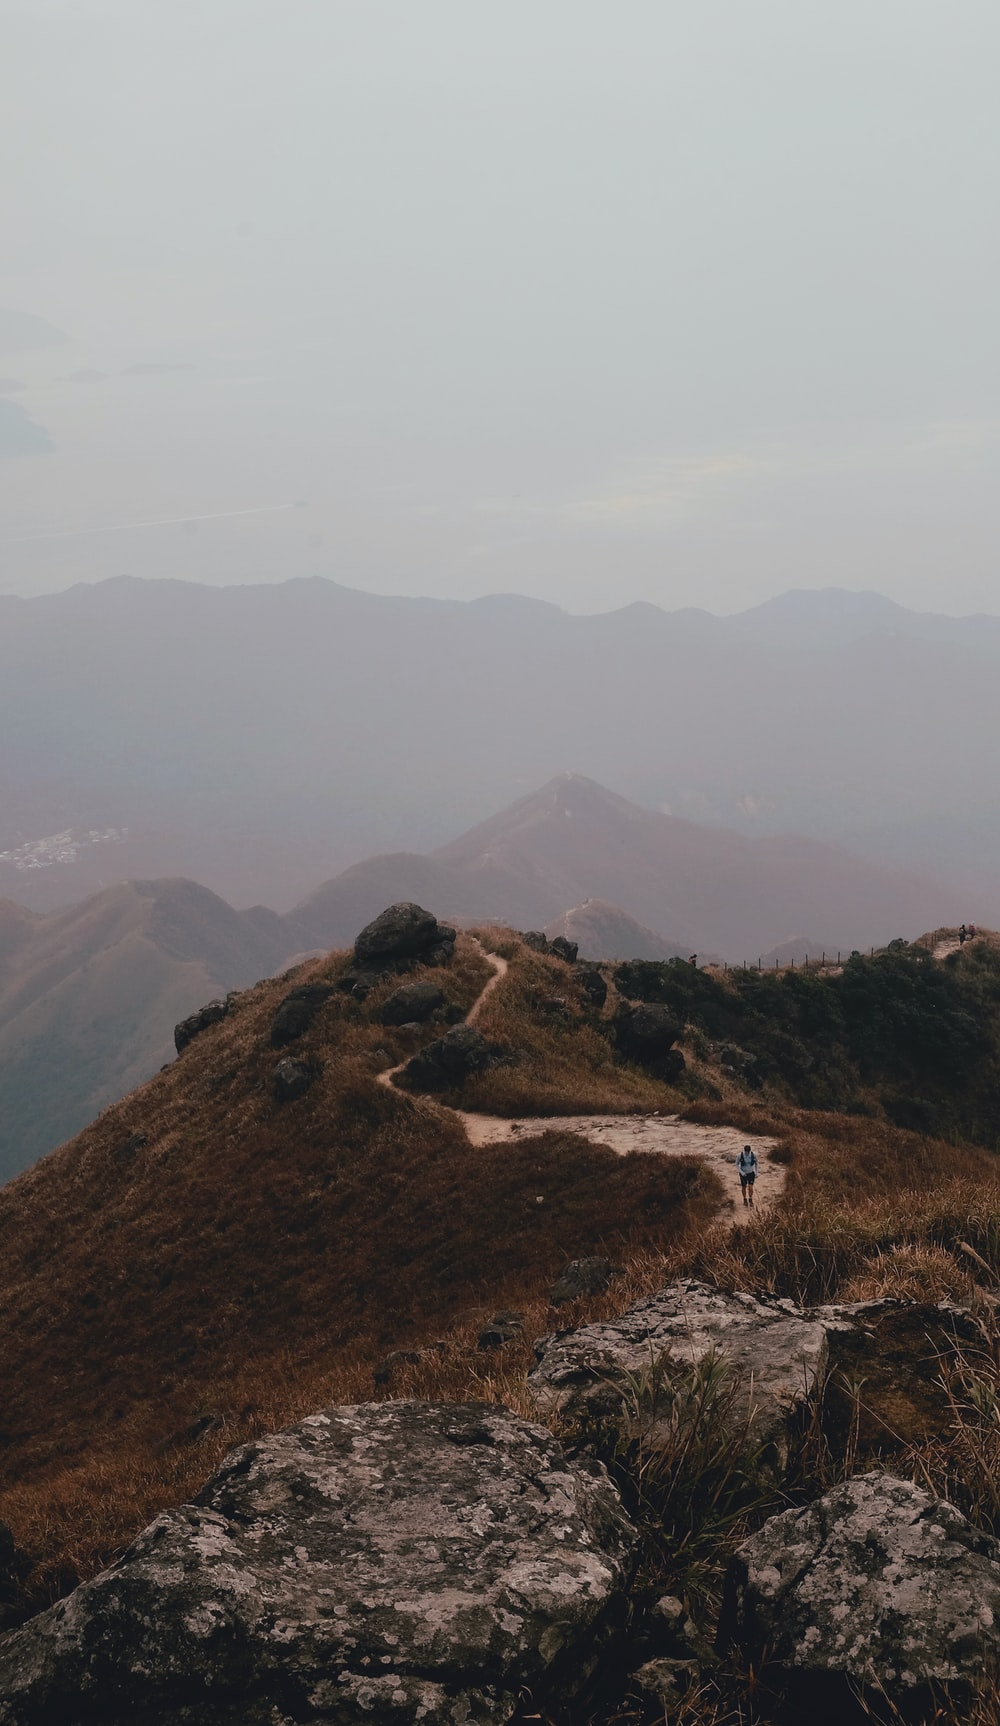 man waking across winding road near mountain ranges